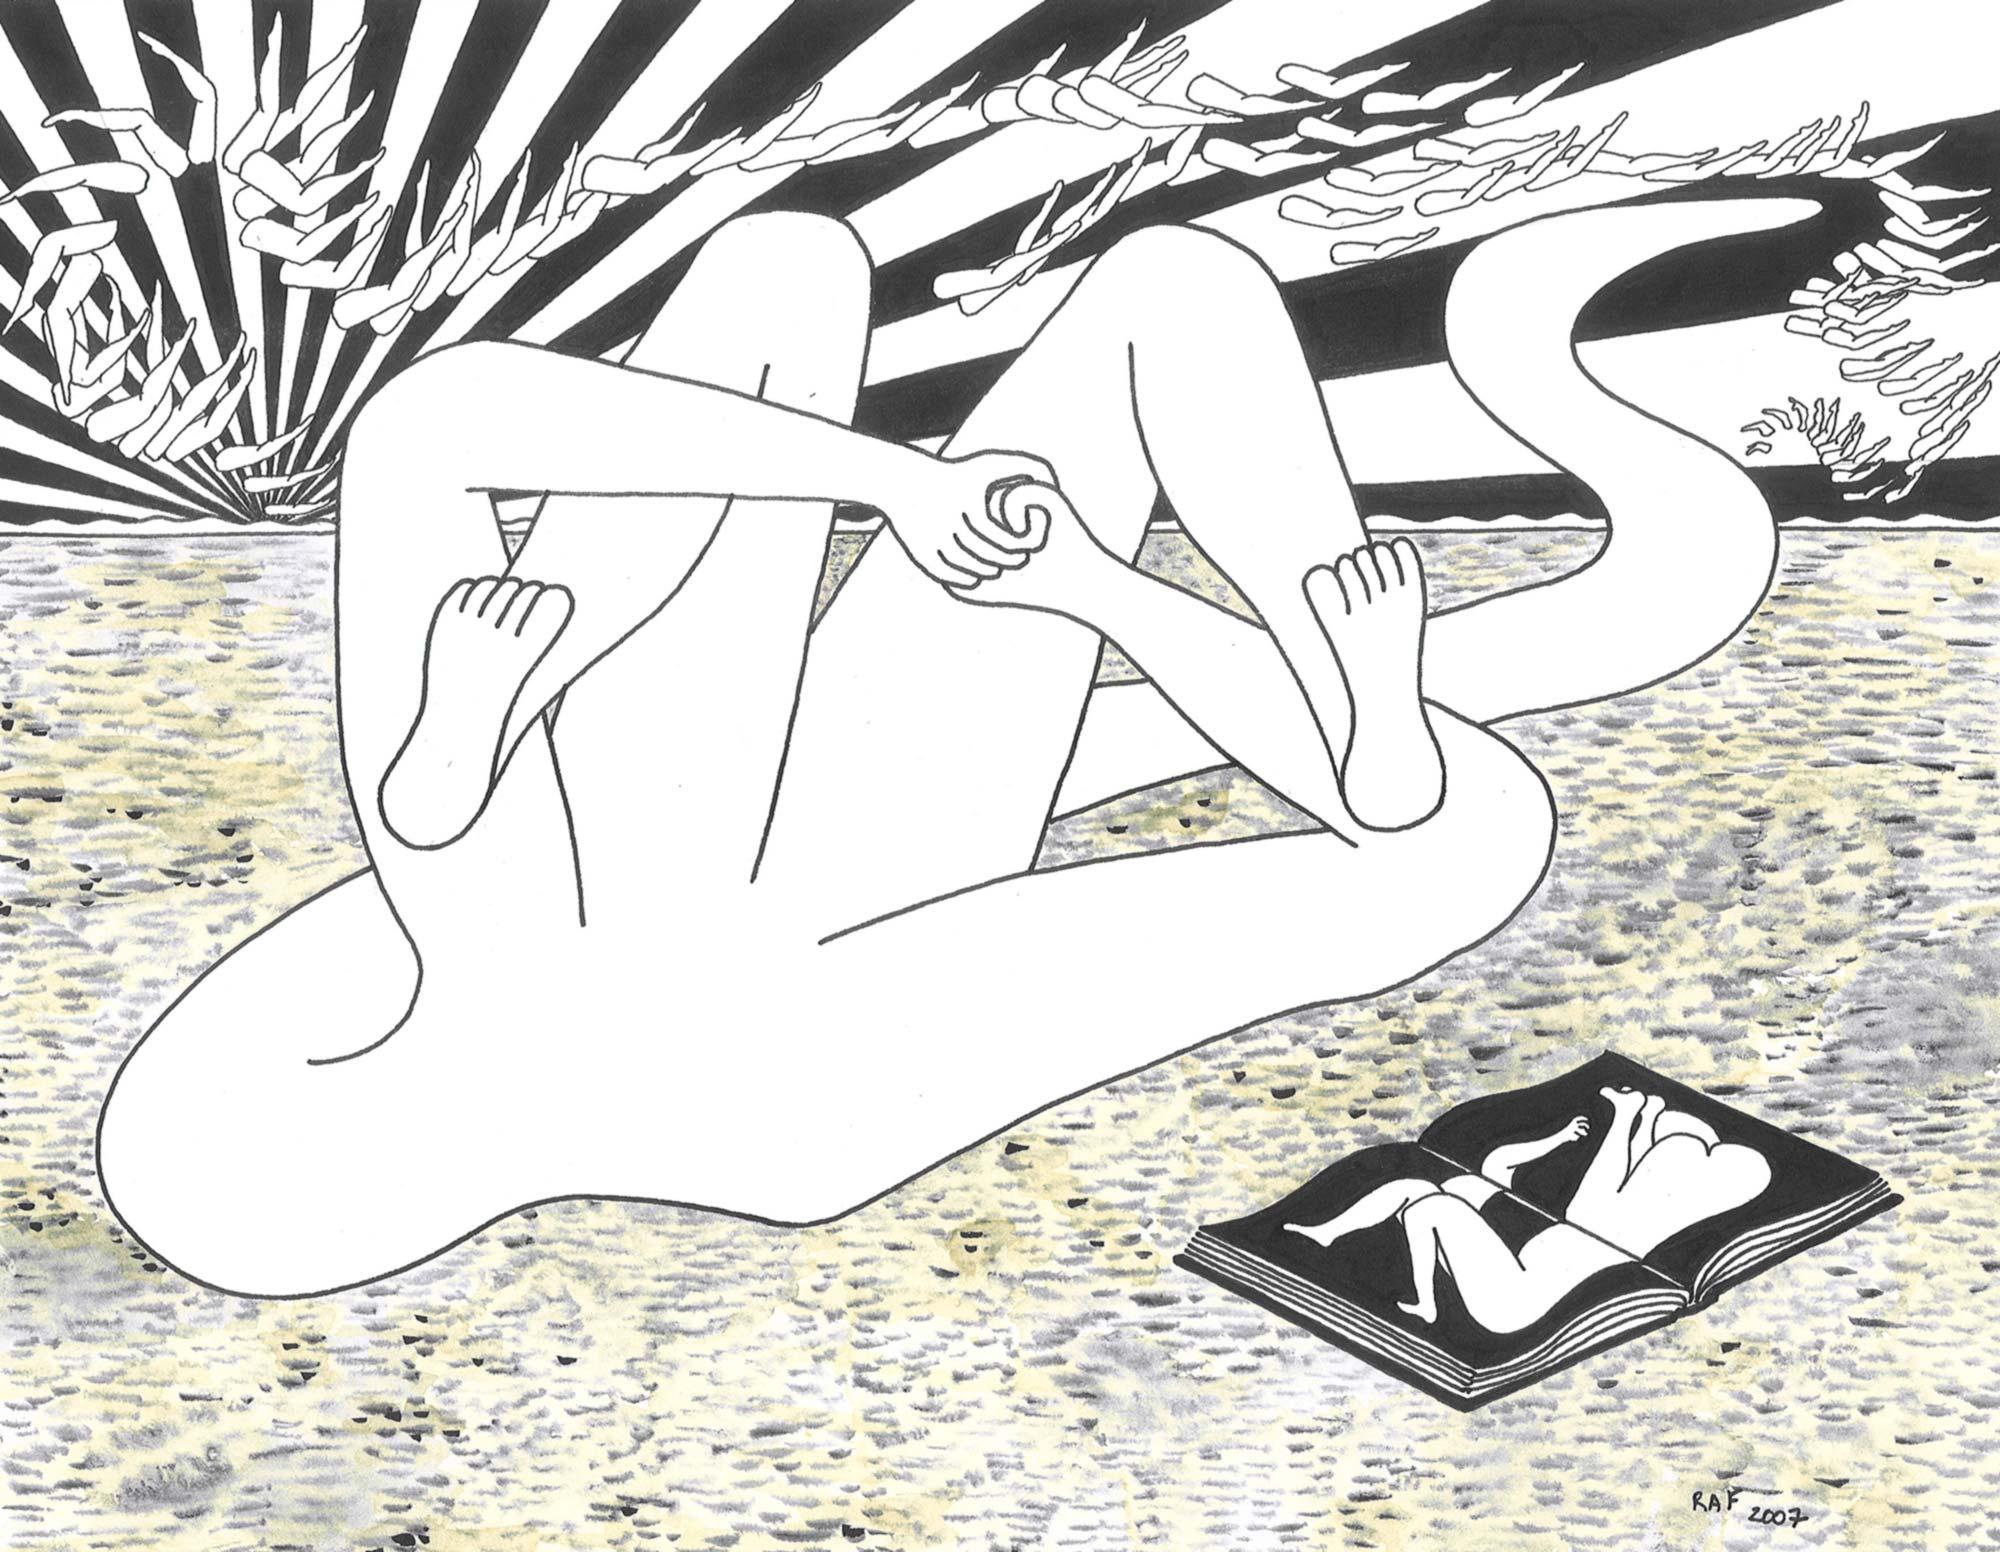 La lectrice, dessin, Raf Listowski, 2007